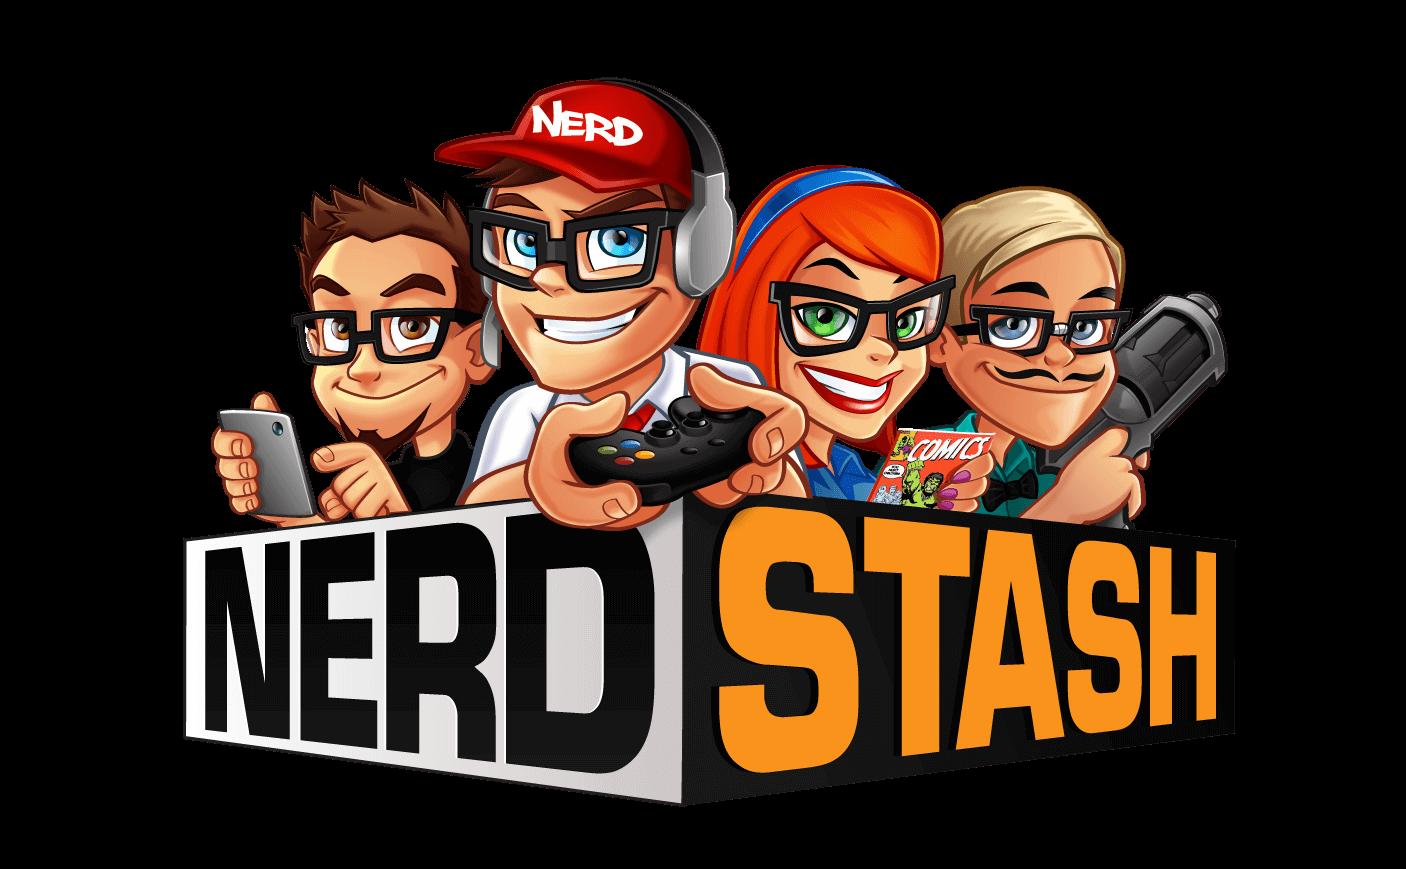 The Nerd Stash...Nerds of the World Unite!